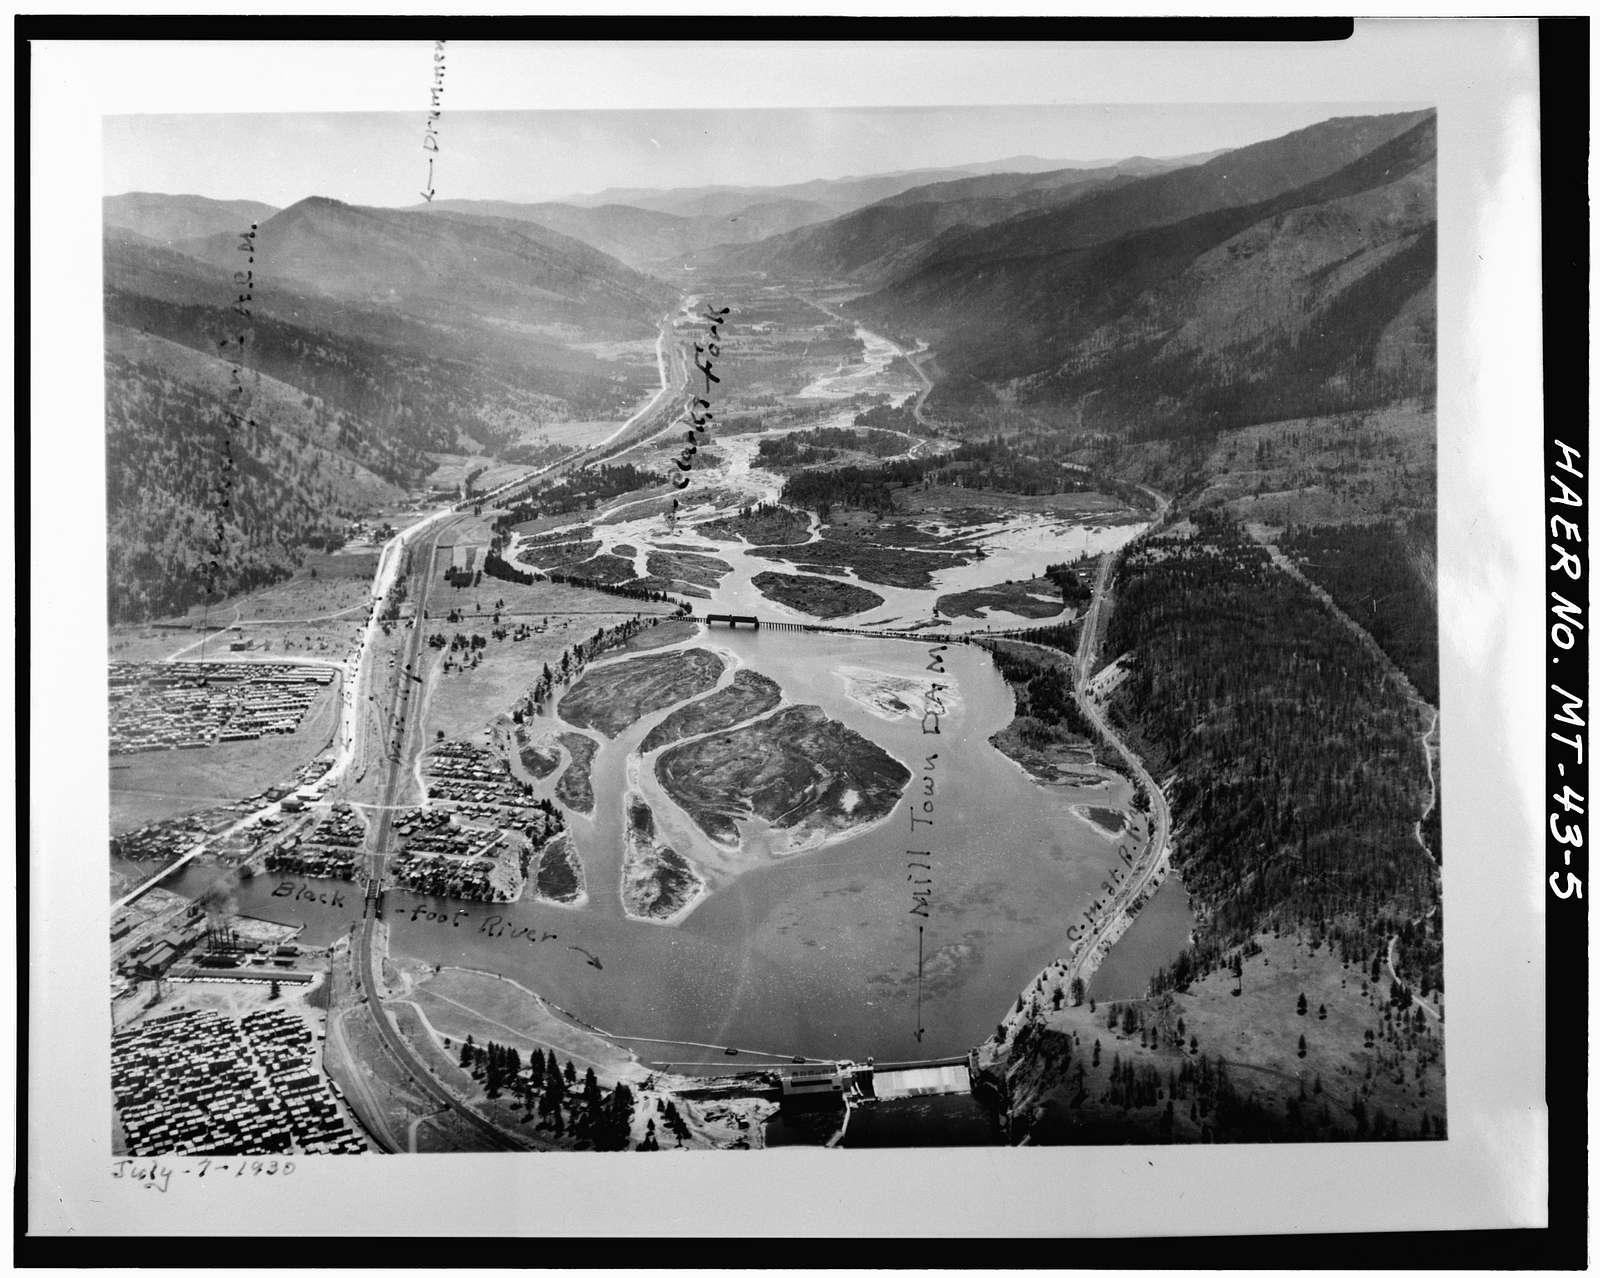 Milltown Dam, Clark Fork River, 6 miles upstream from Missoula, Milltown, Missoula County, MT